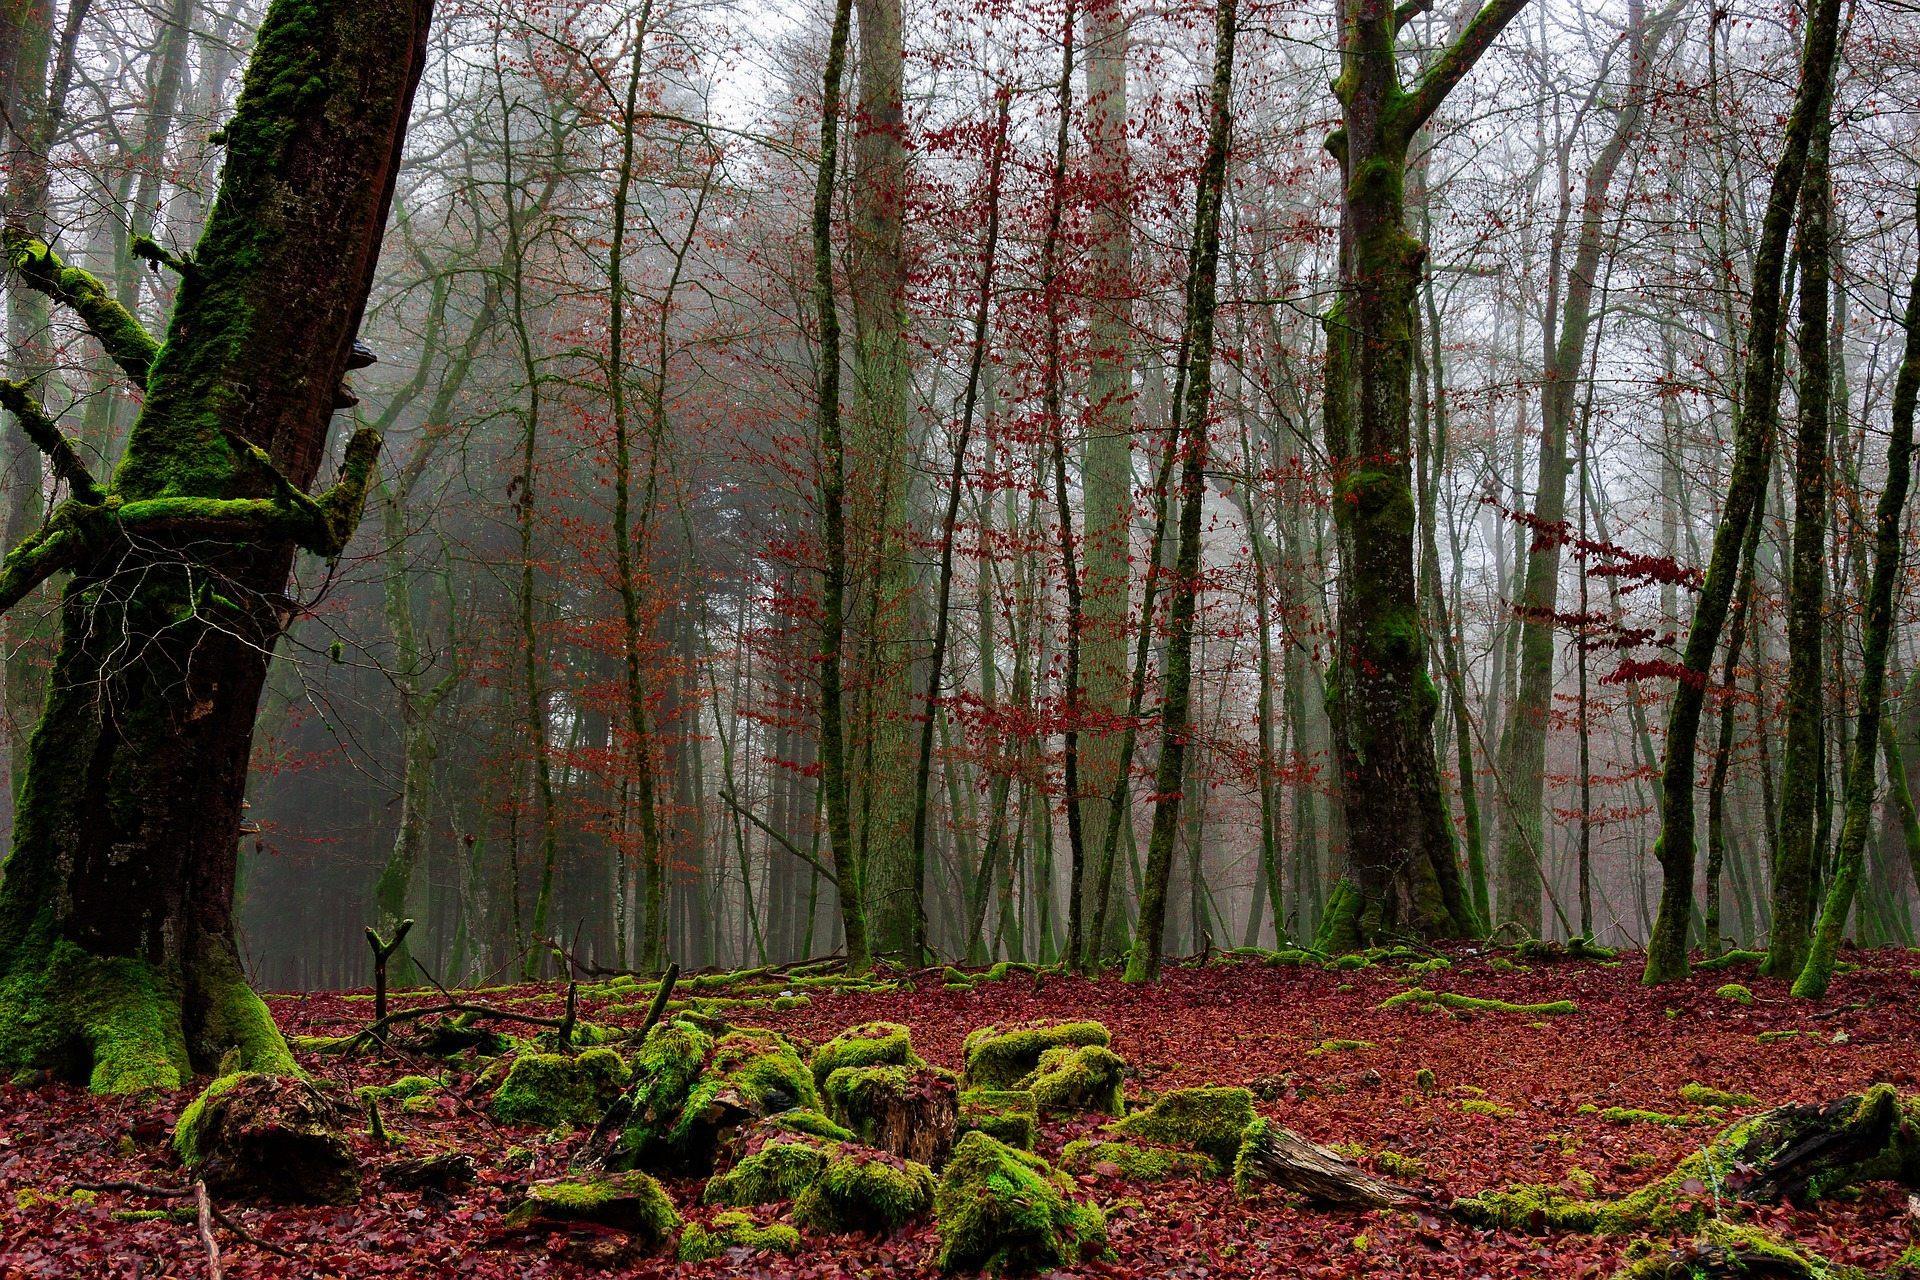 лес, мох, осень, деревья, холод, туман, пасмурно, сыро